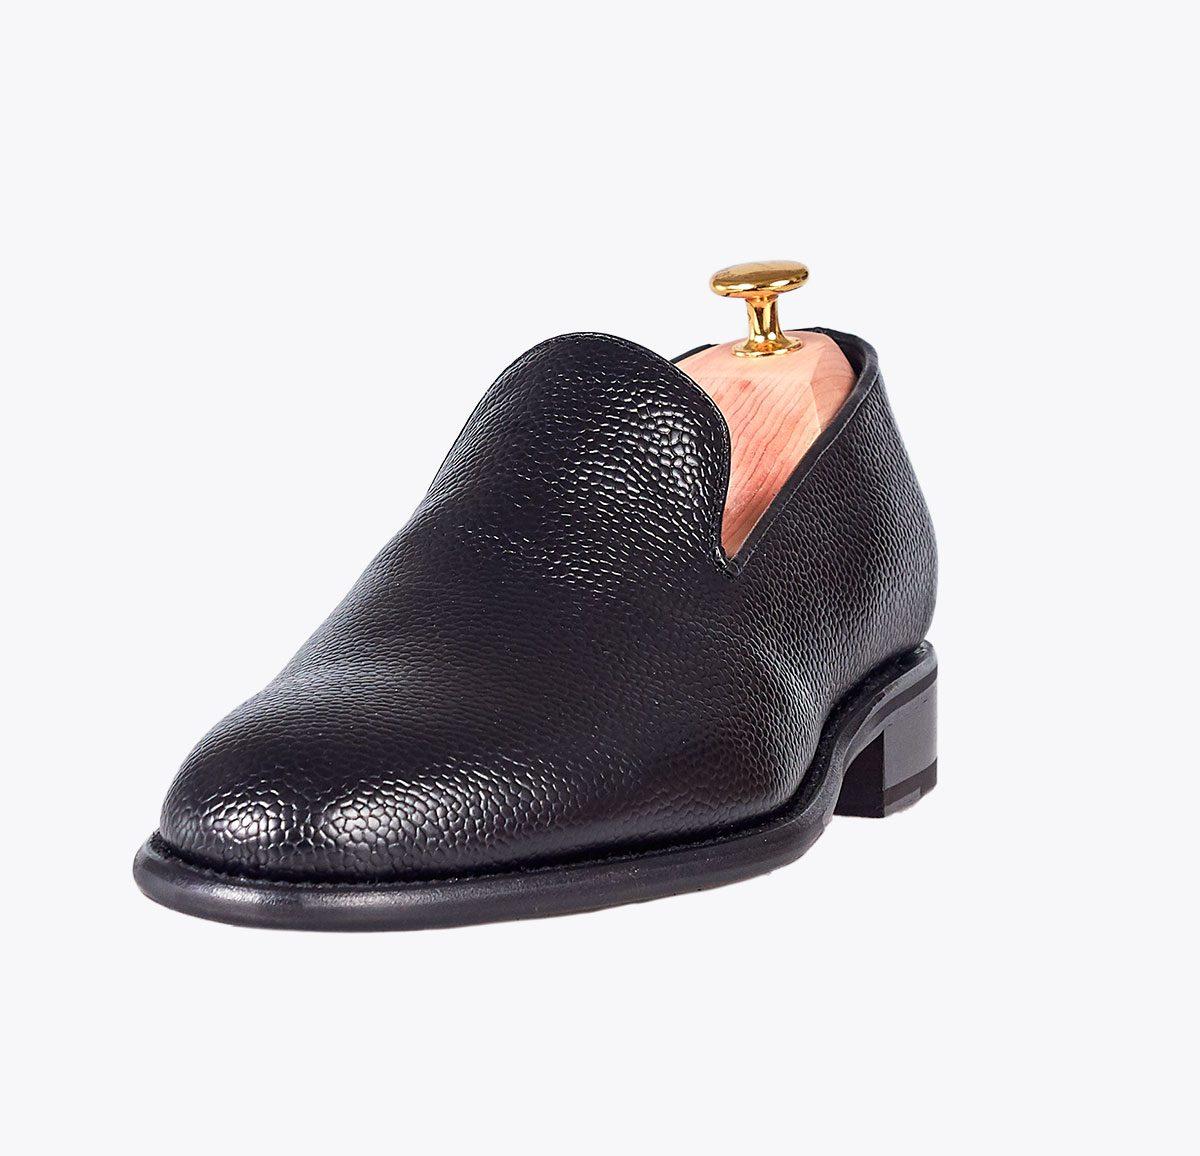 Zapato velázquez hecho a mano en mandalashoes, Santanyí Mallorca. Hand made shoes. Nach Mass Schuhe